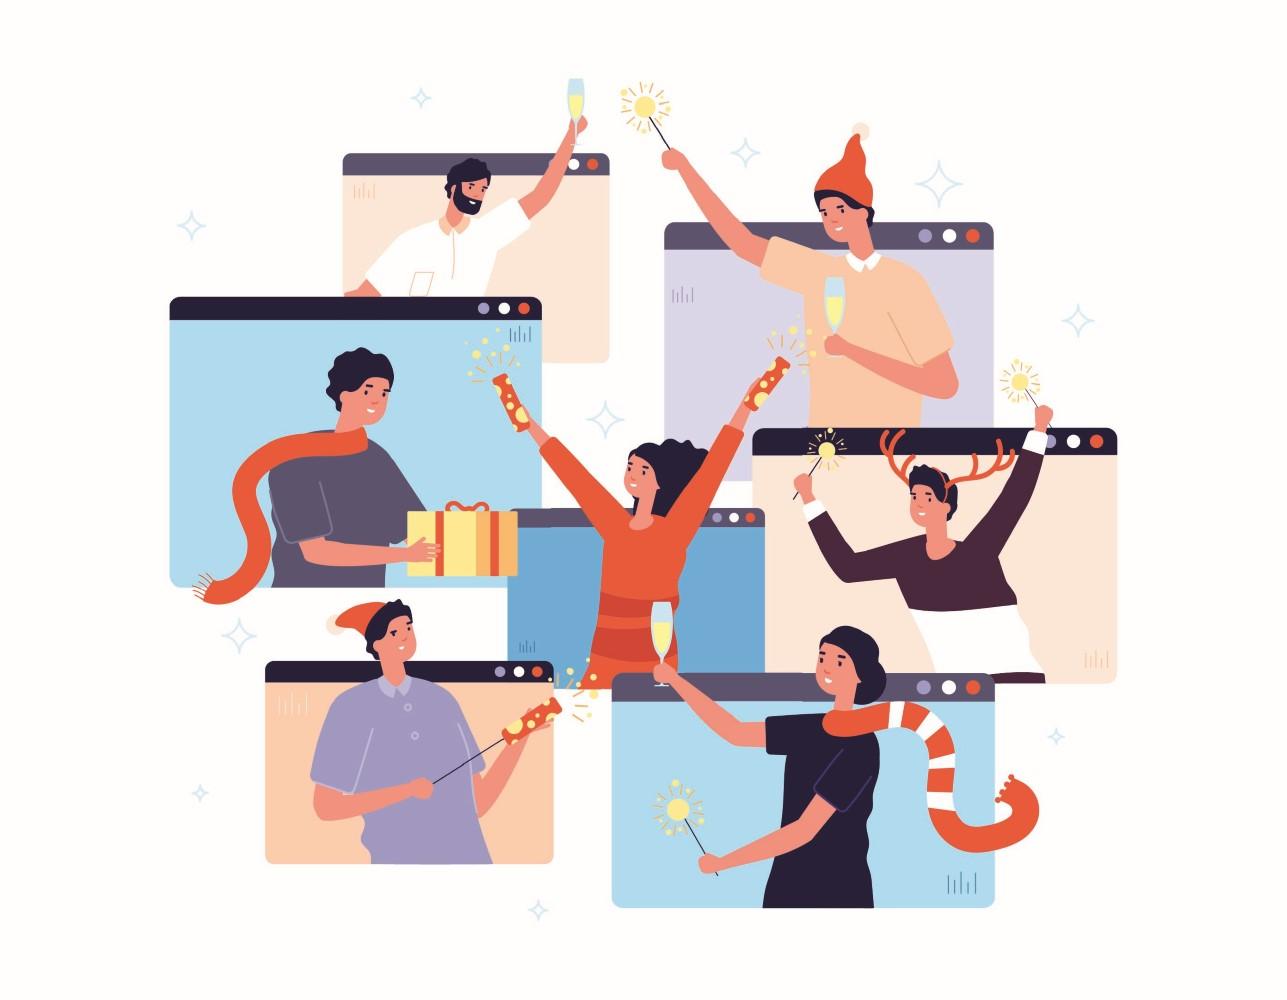 activitati distractive online